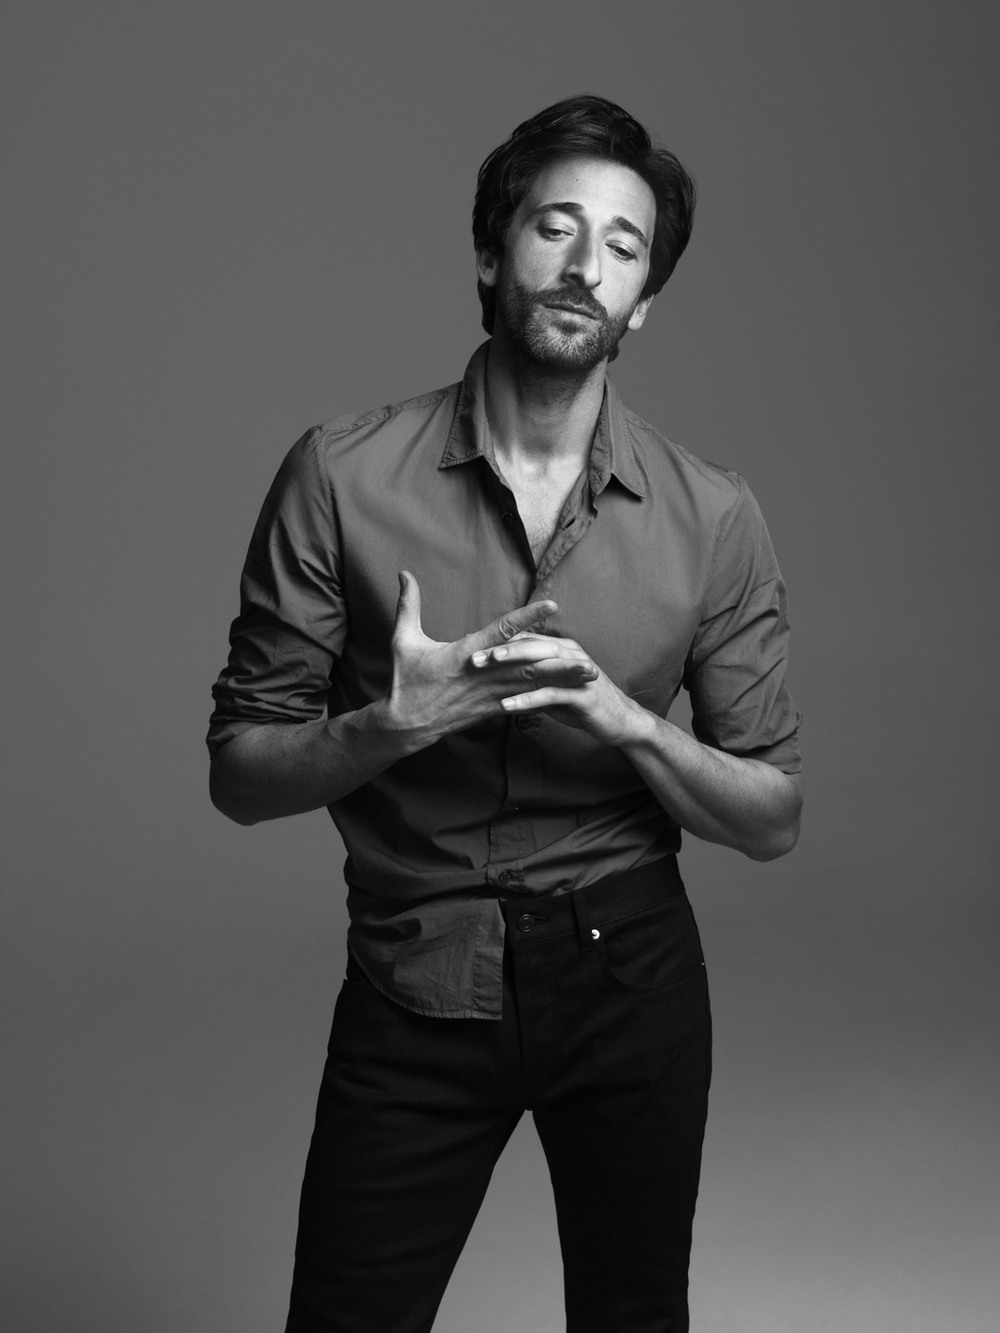 Adrien-Brody-1